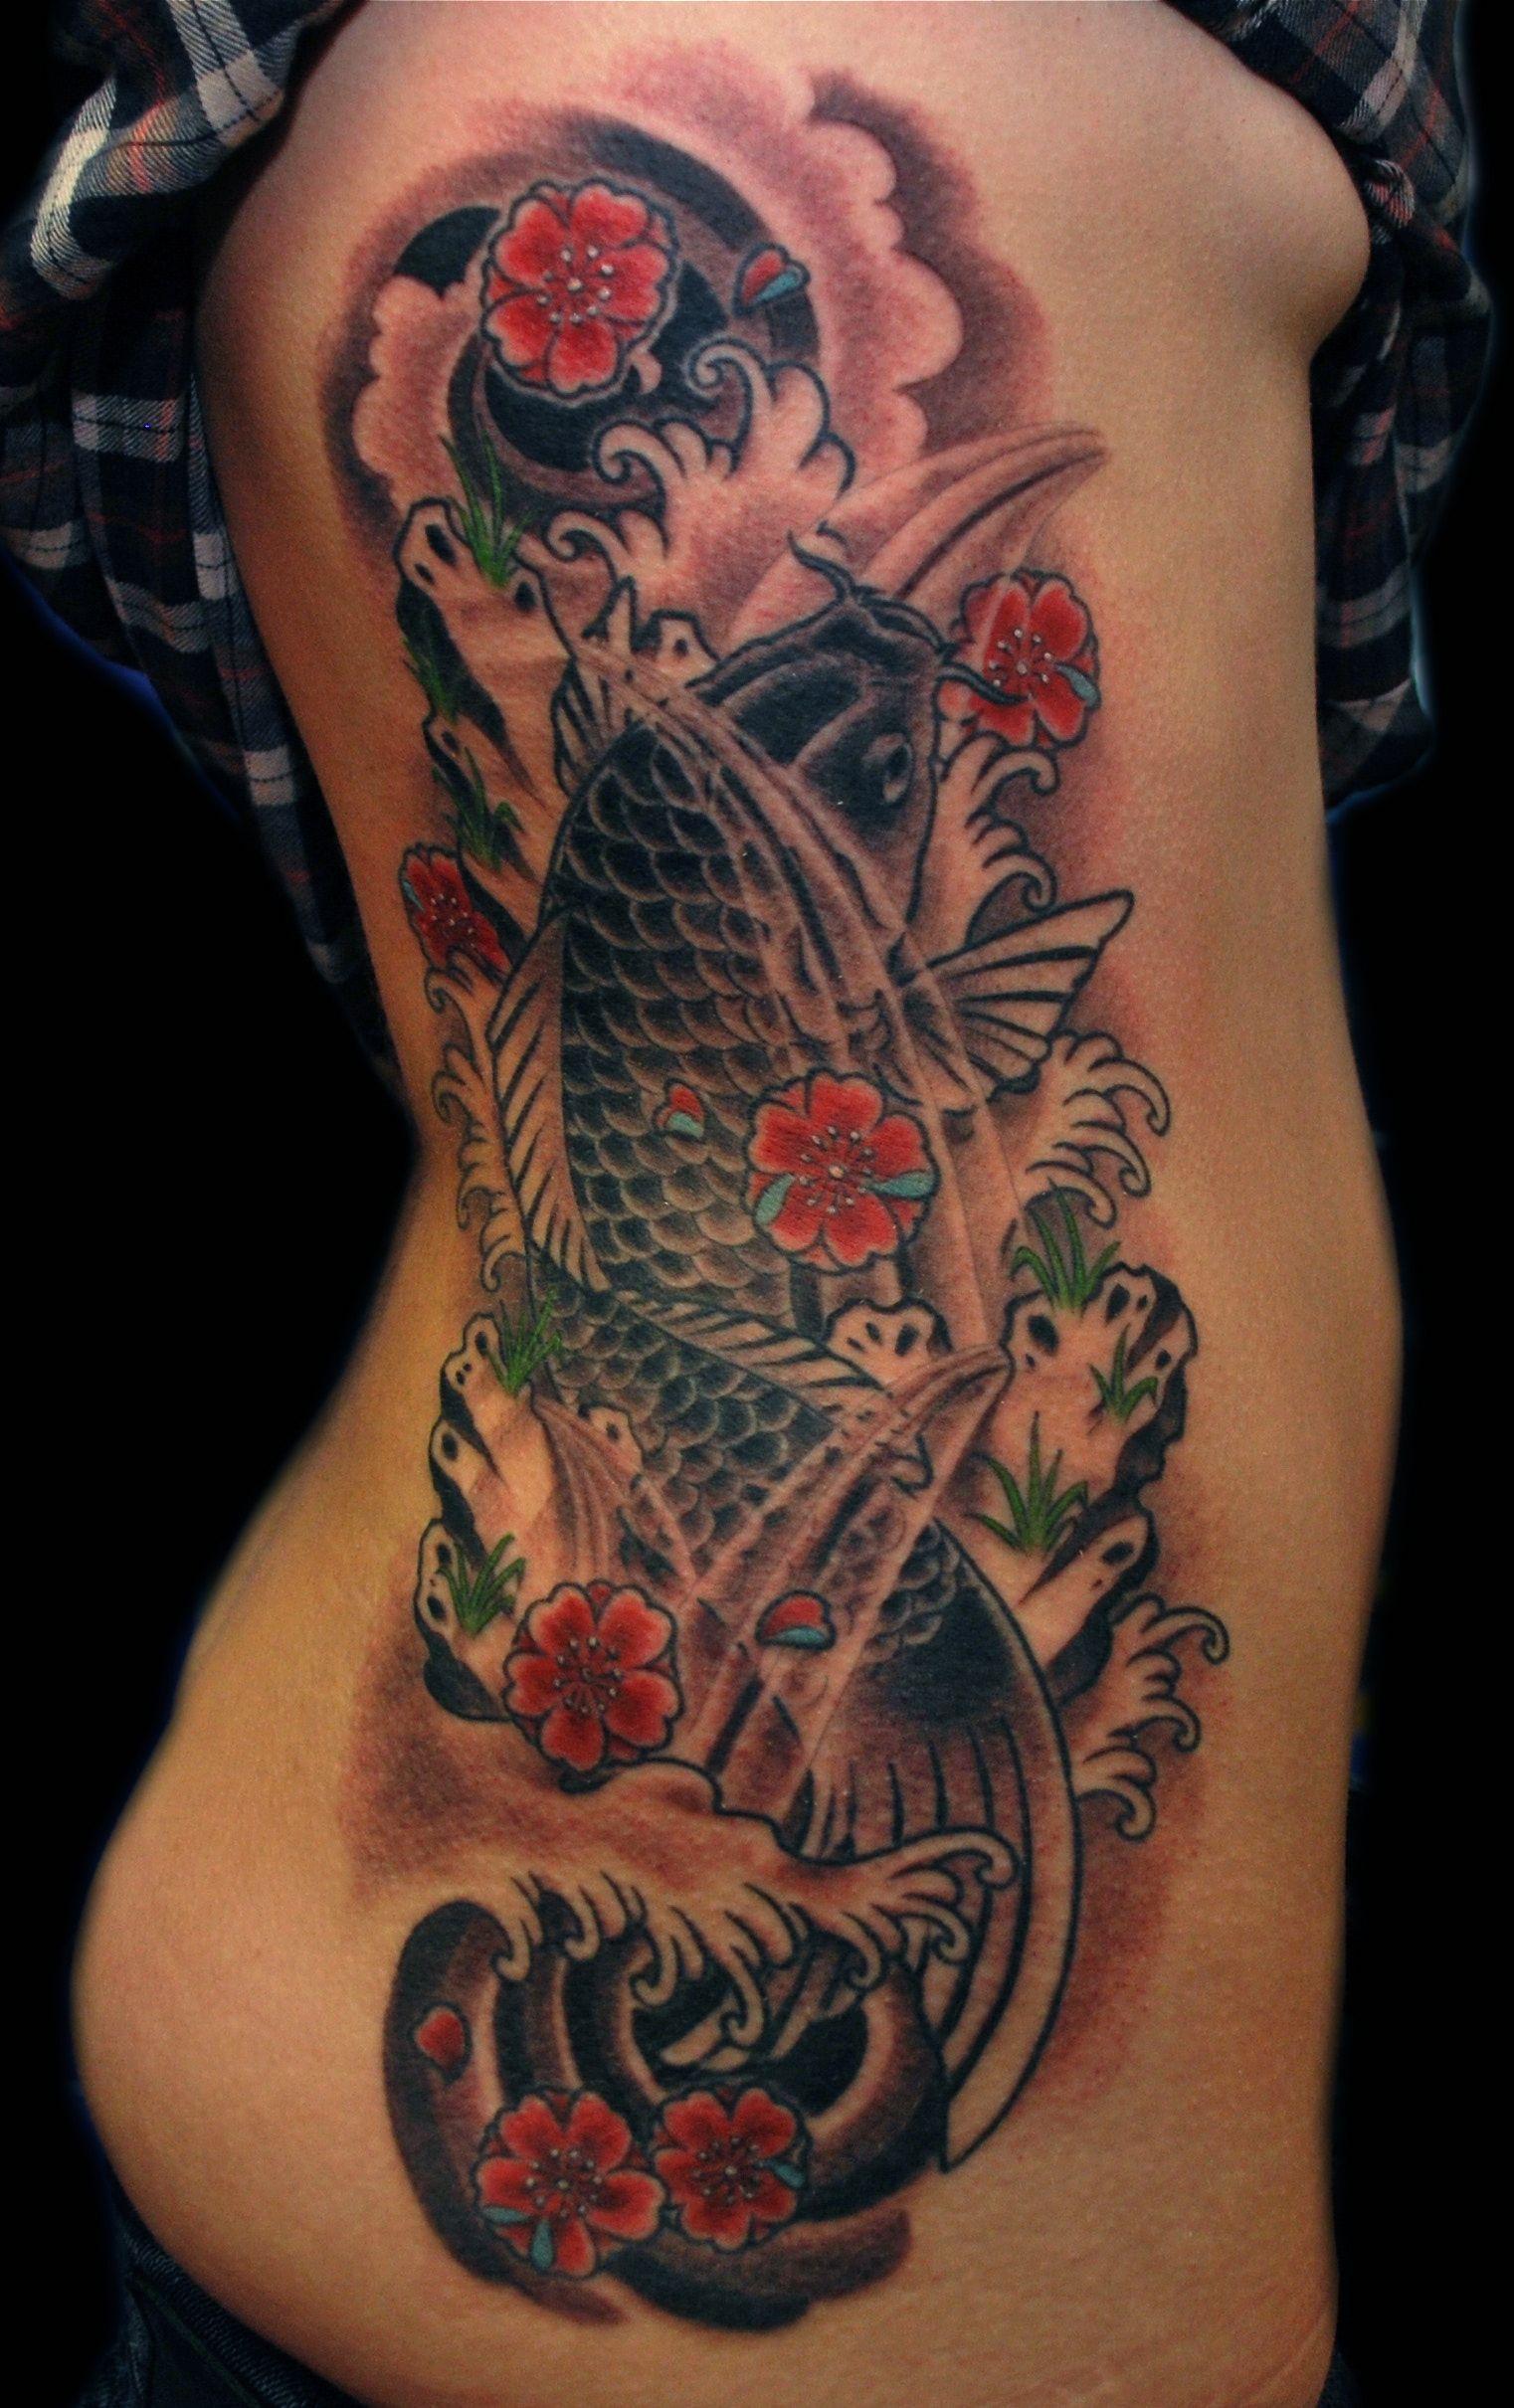 Tattoo Oriental Full Color Black Cherry Blossom Carpa Fish